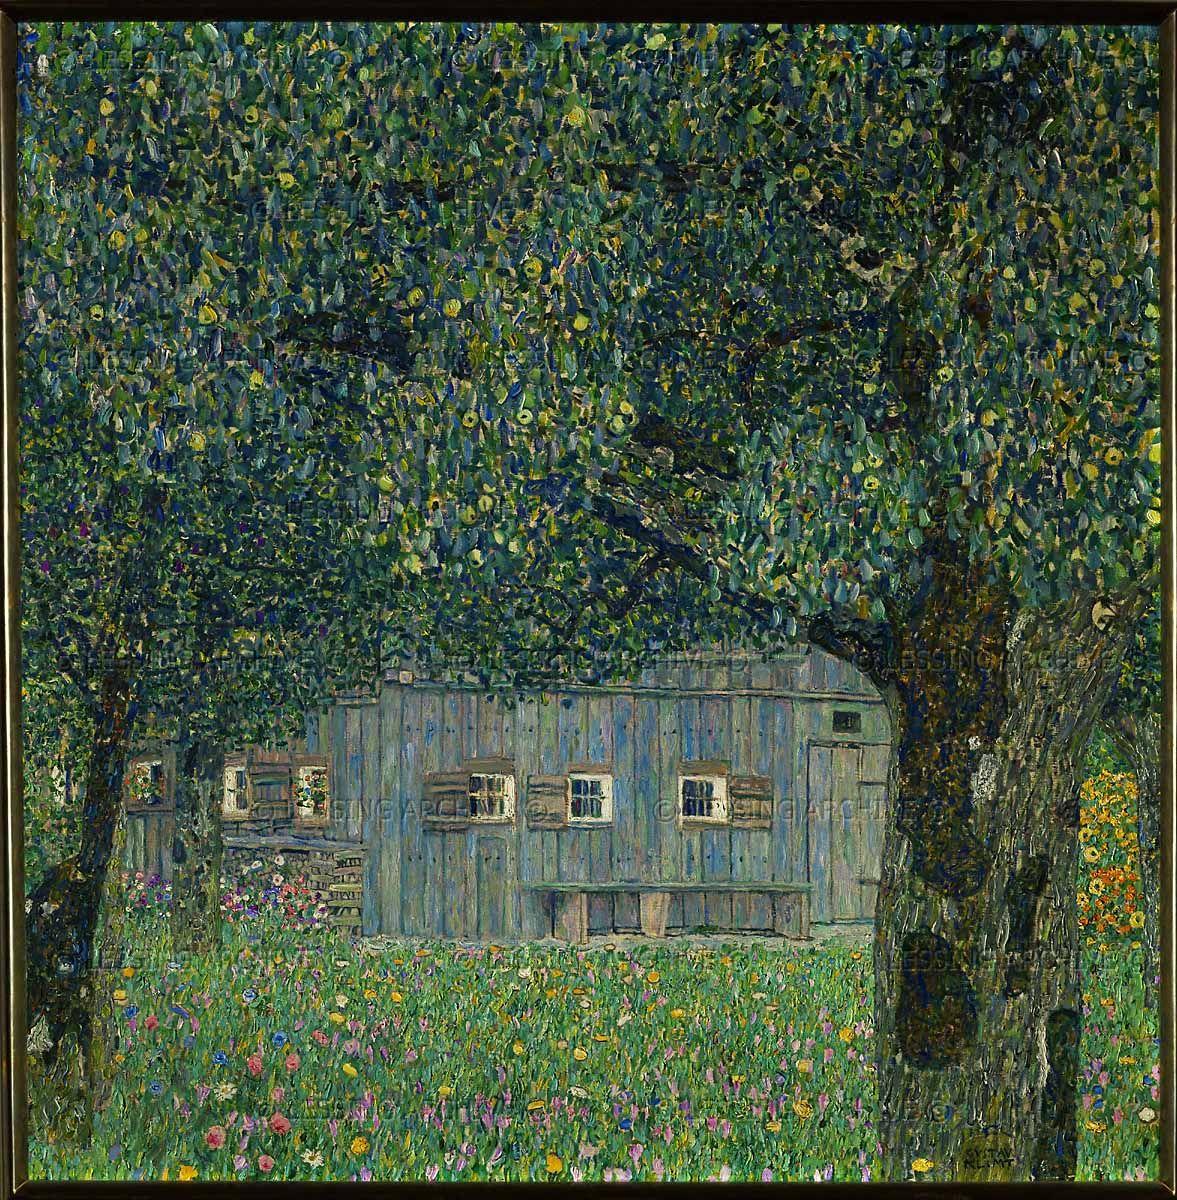 Daybook Landscape Gustav Klimt Klimt Art Gustav Klimt Klimt Paintings